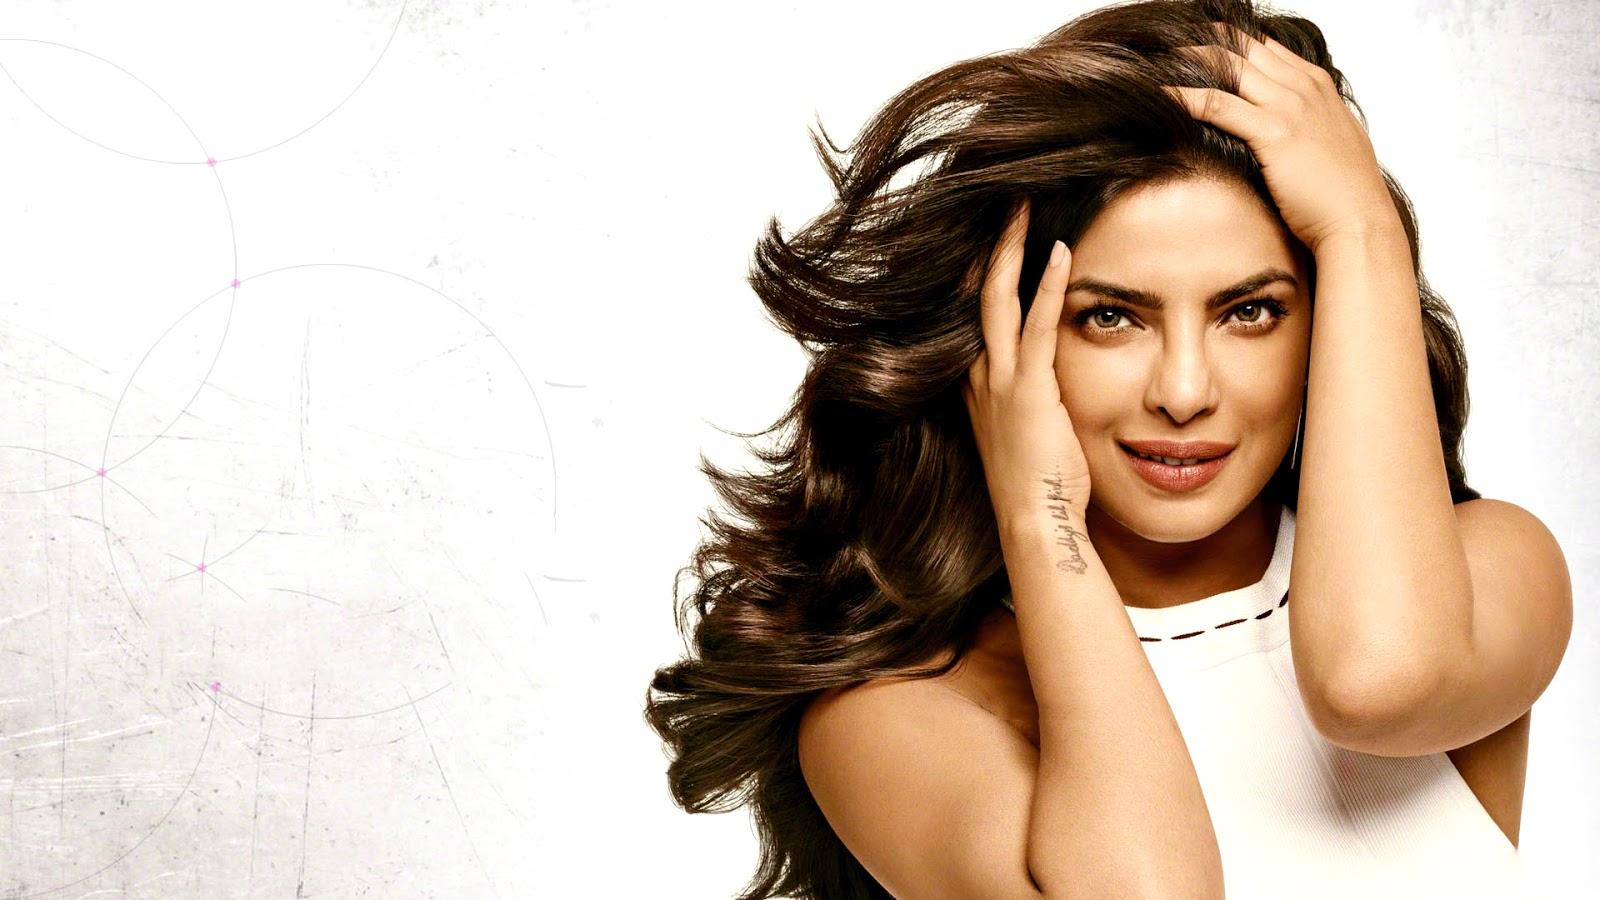 Priyanka Chopra Wallpapers Hd Download Free 1080P -6968